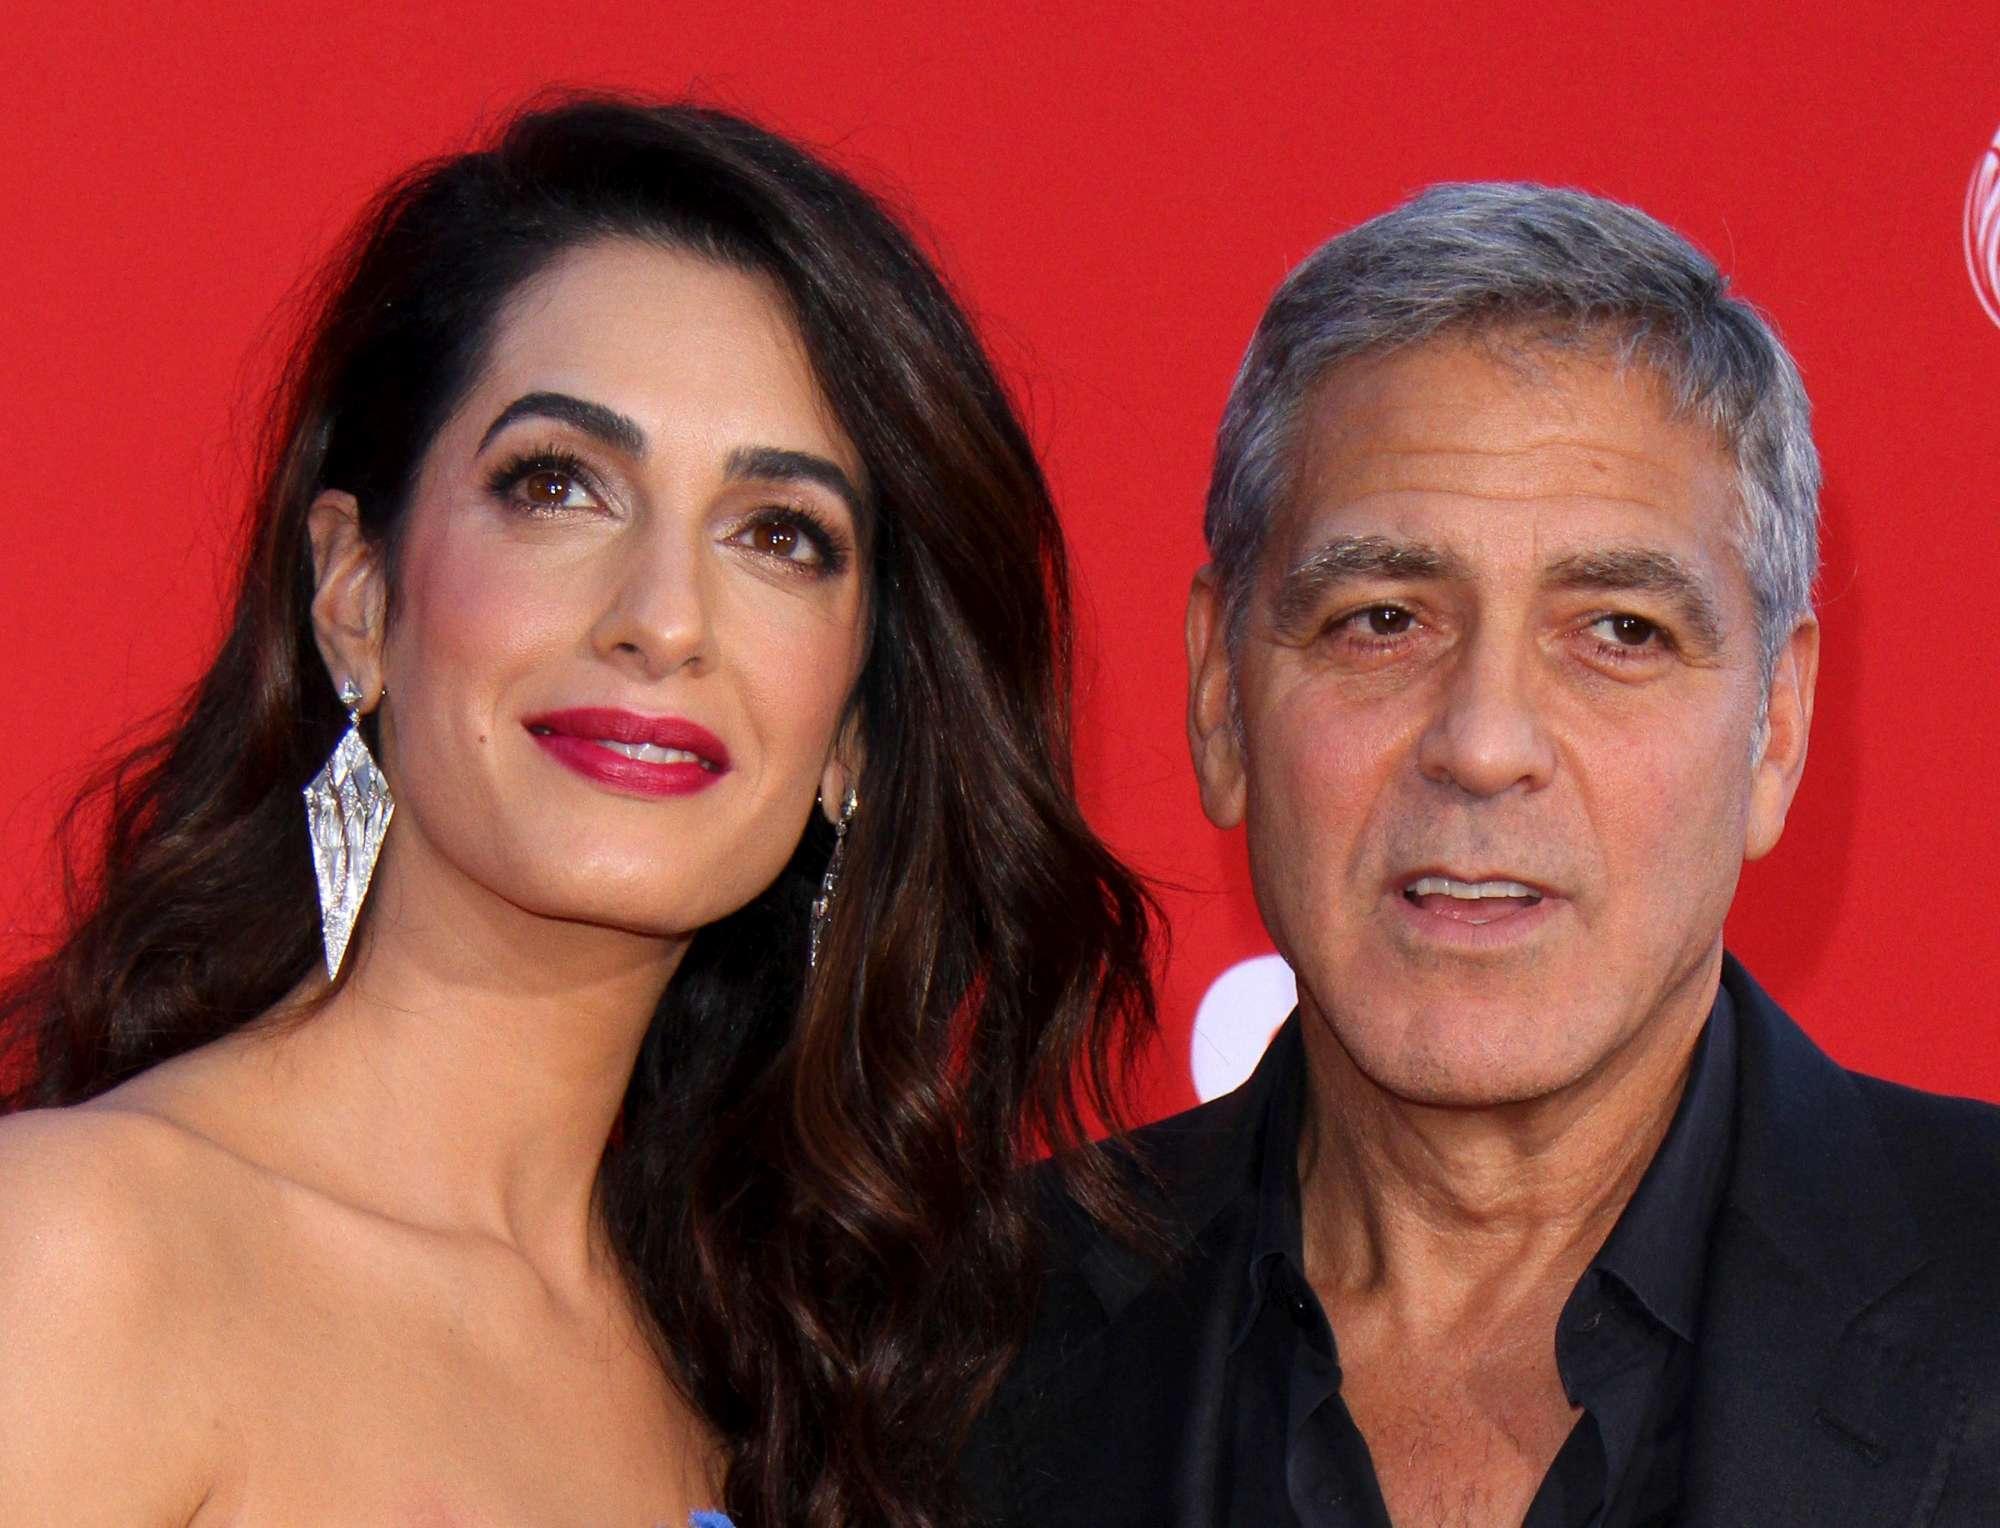 Amal Clooney compie 40 anni: guarda le sue foto più belle